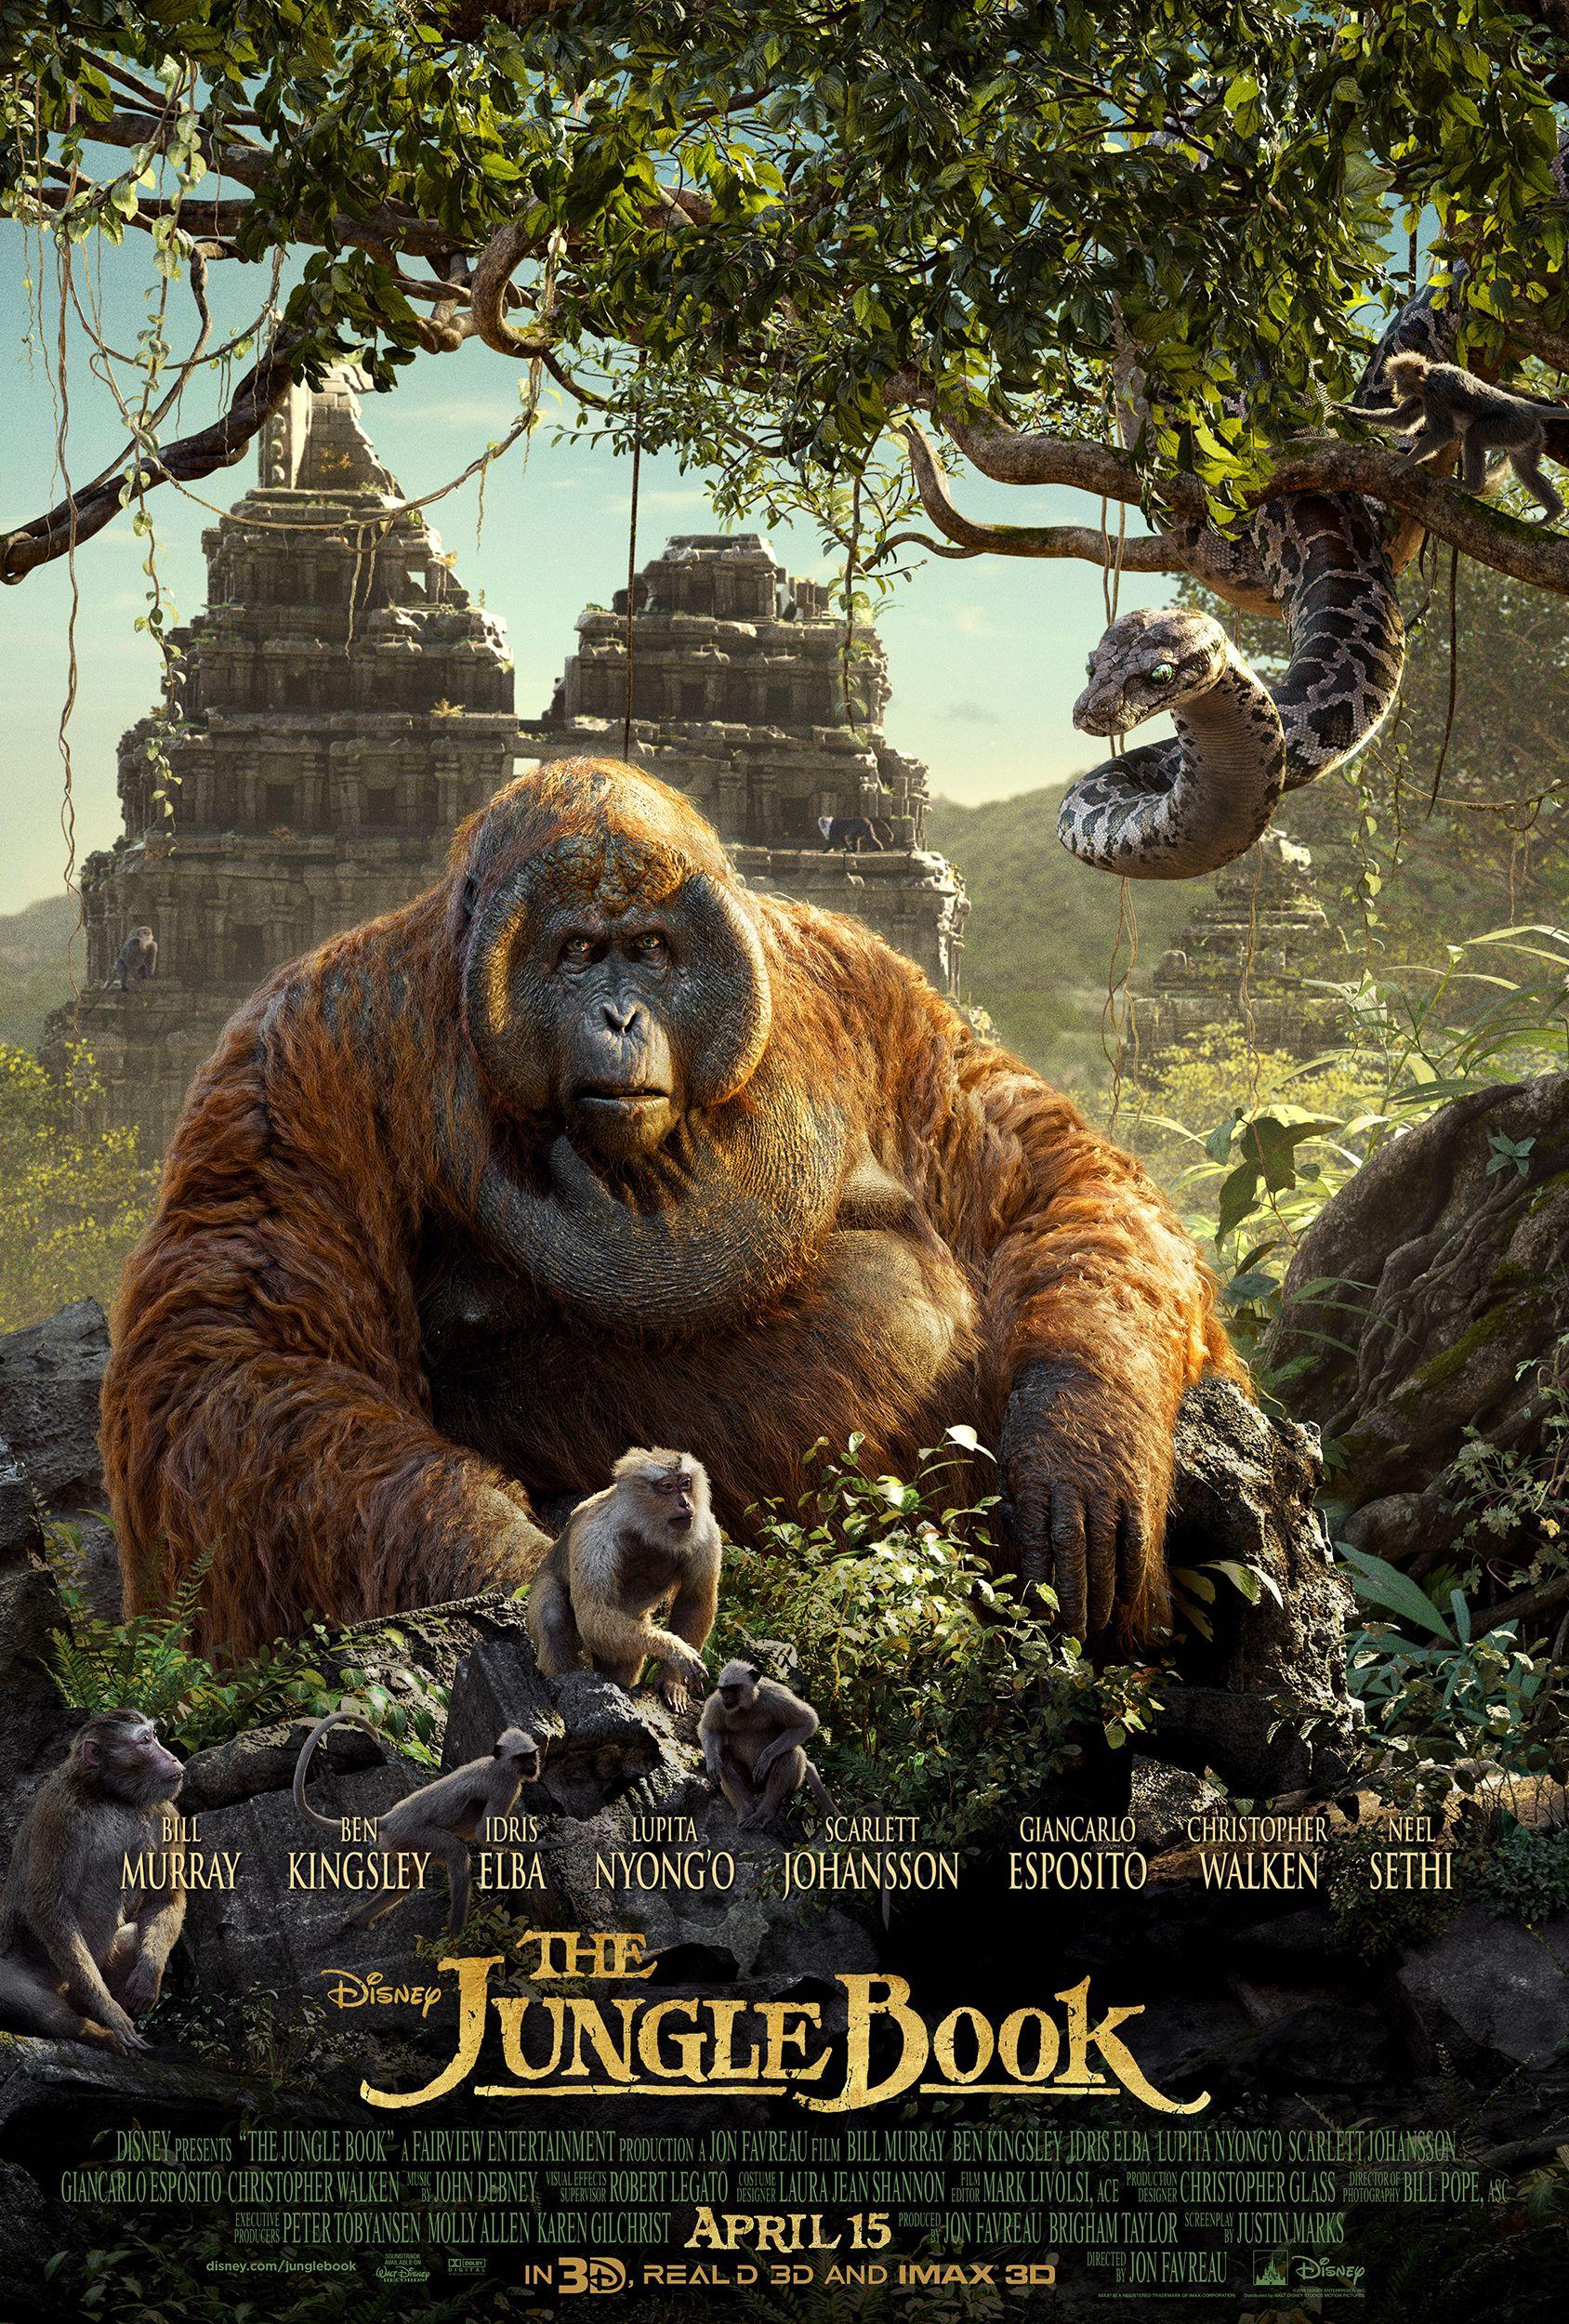 Animal Sec Movies meet smooth-talking king louie (voice of christopher walken